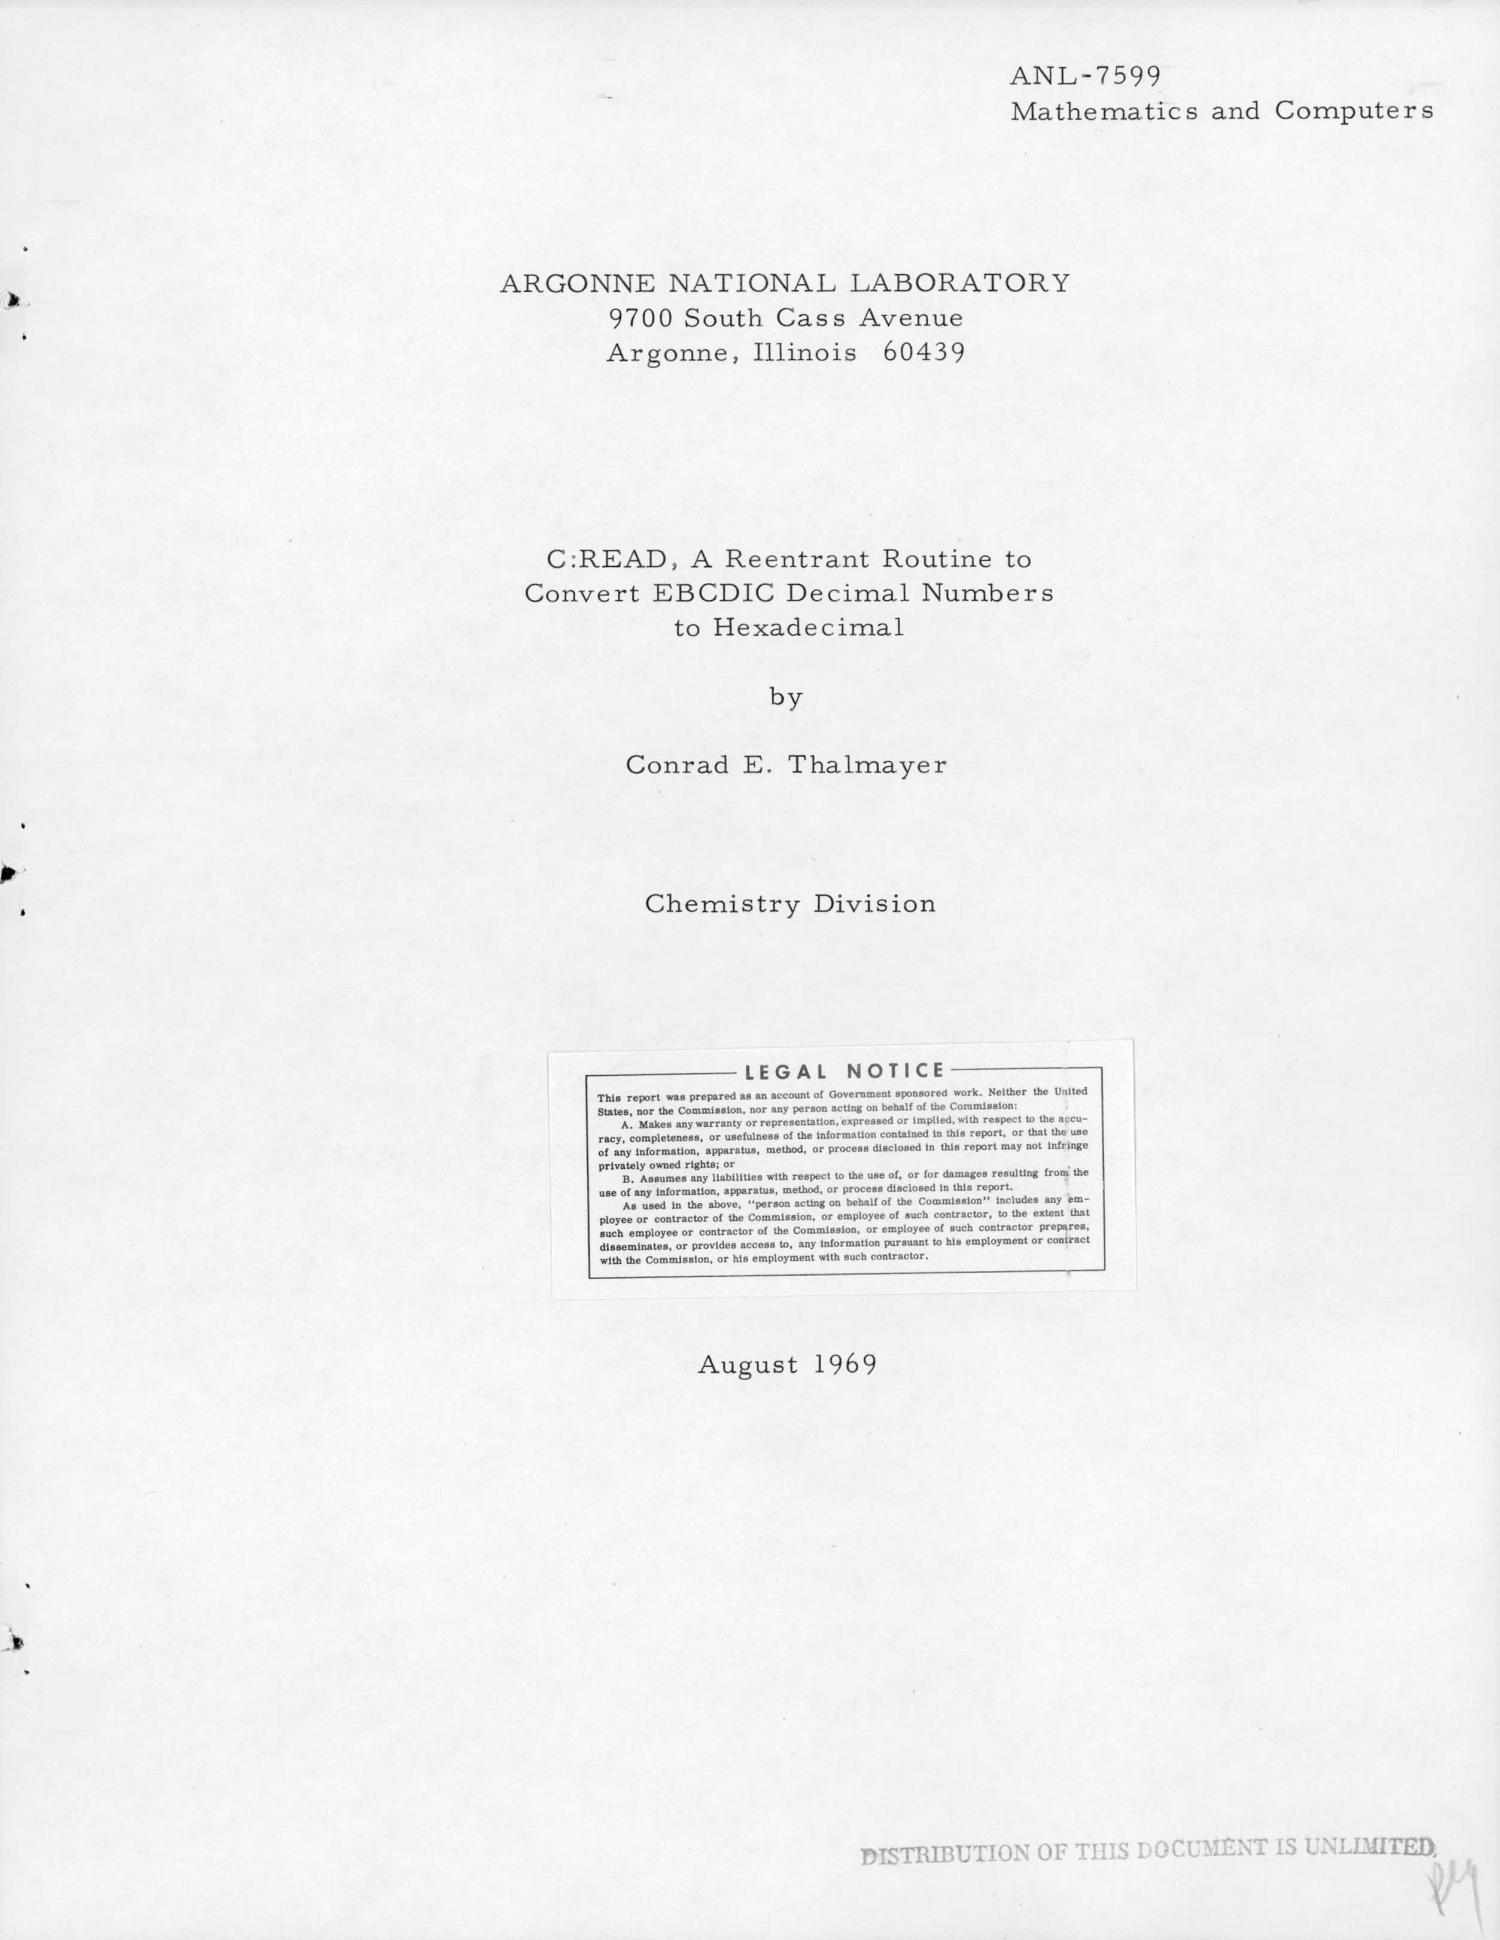 C:READ: A REENTRANT ROUTINE TO CONVERT EBCDIC DECIMAL